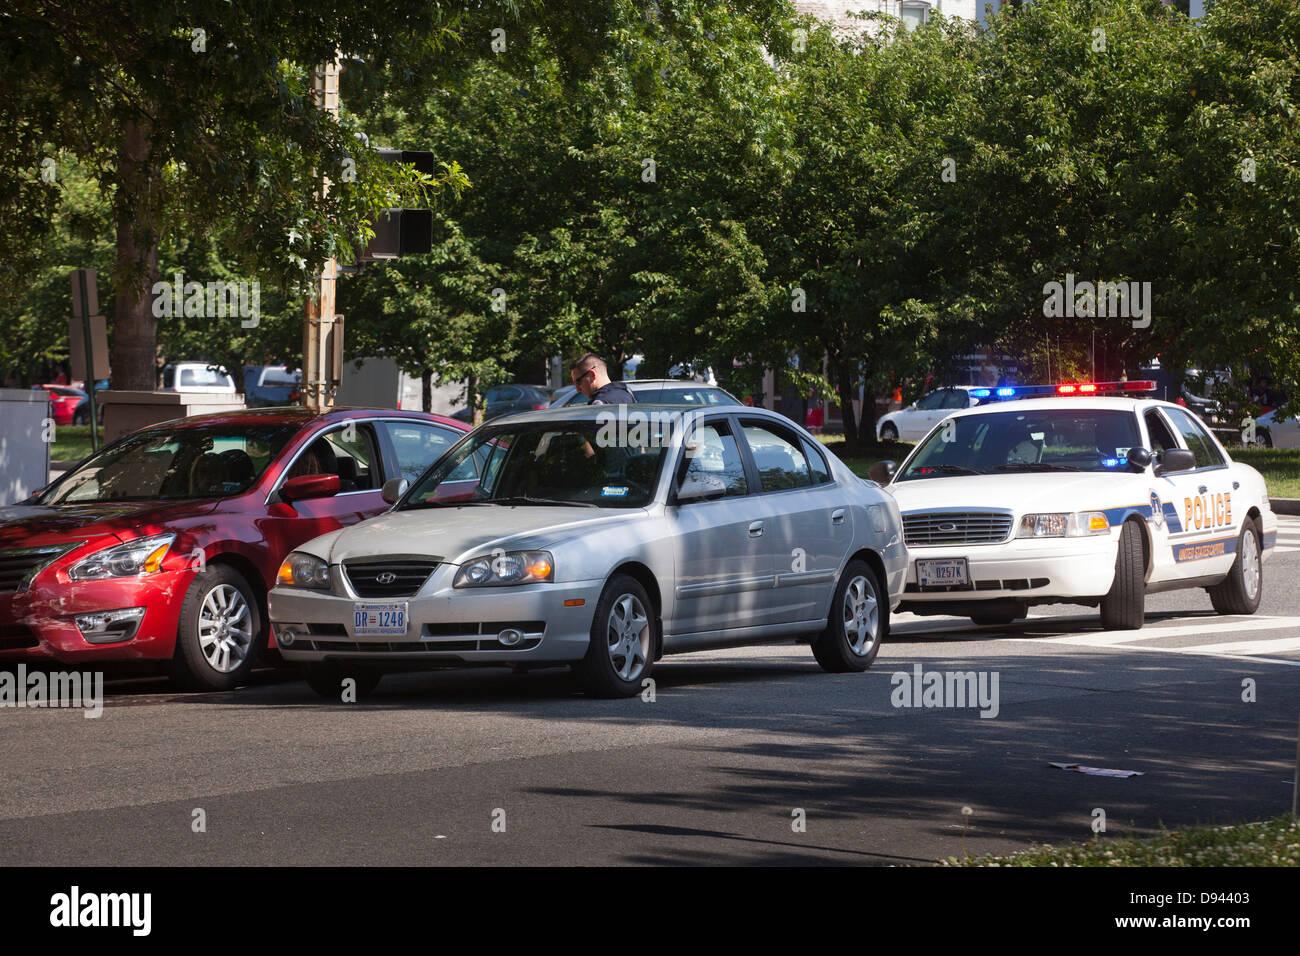 Police at minor traffic accident scene - Washington, DC USA - Stock Image